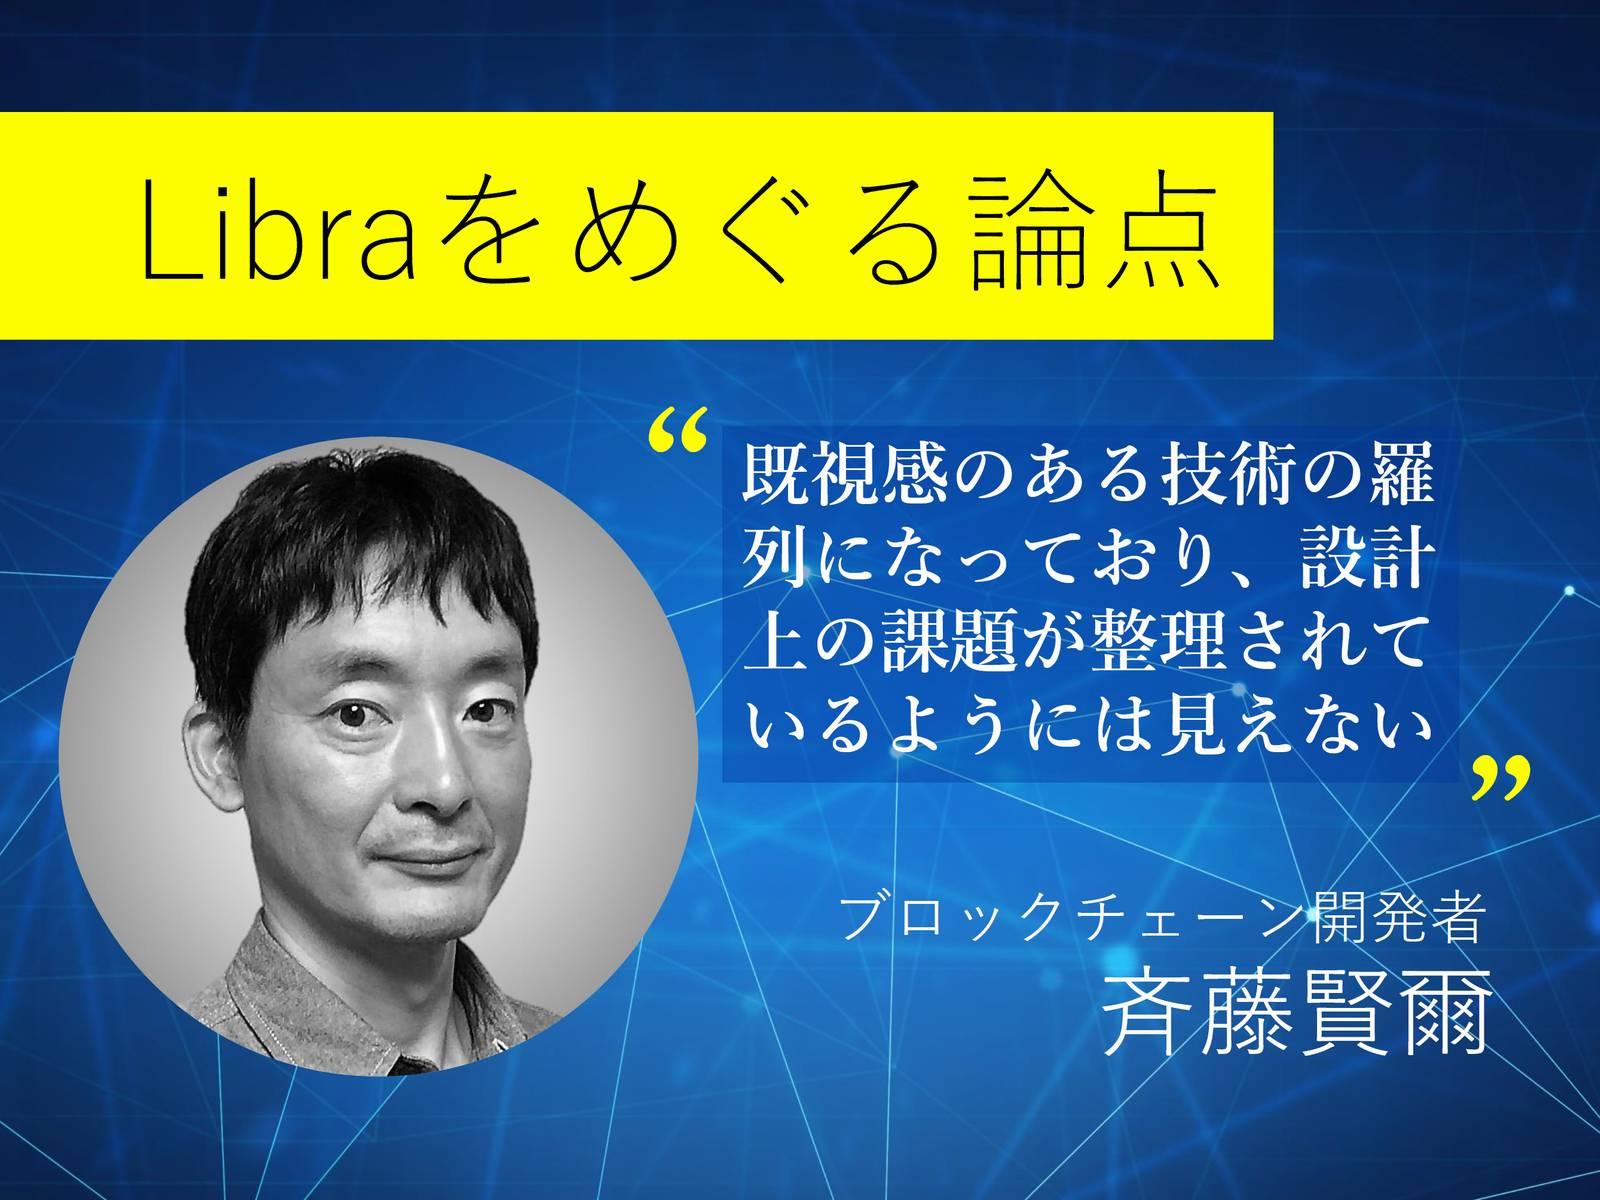 Libraは目的と手段がちぐはぐで整合性に欠ける ― 斉藤賢爾(ブロックチェーン開発者)